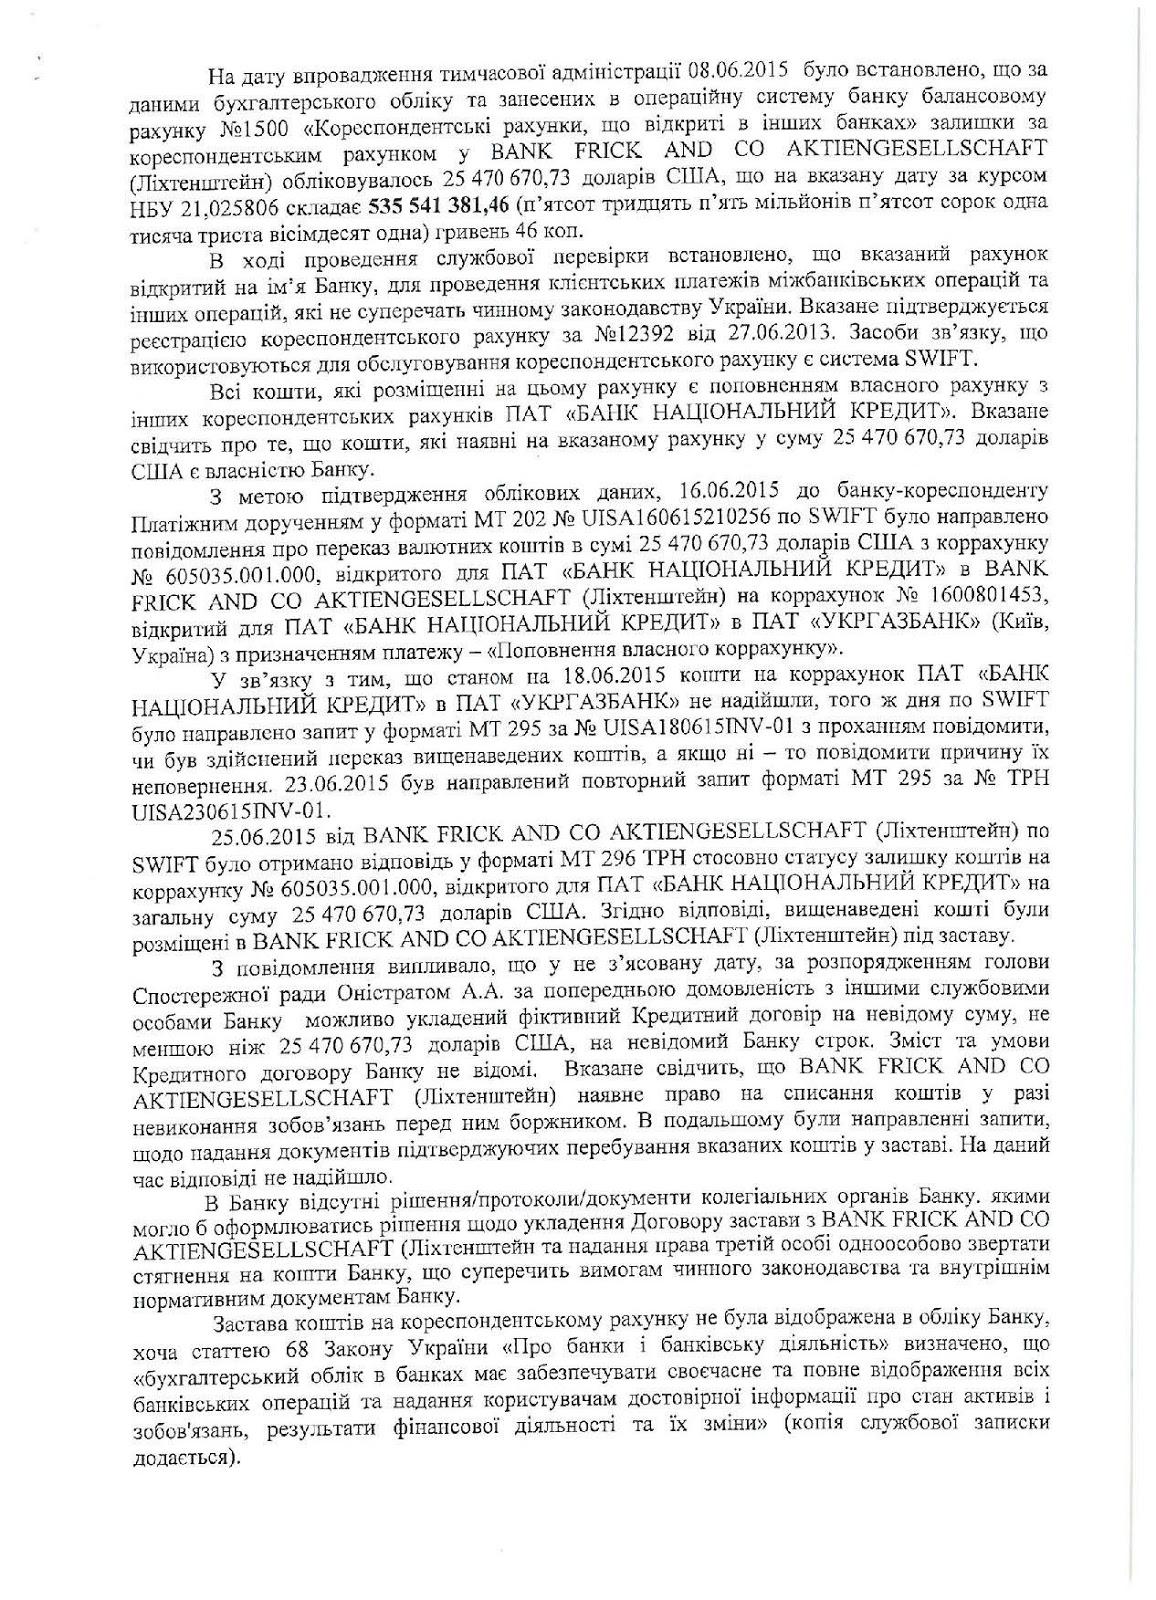 onistrat-4